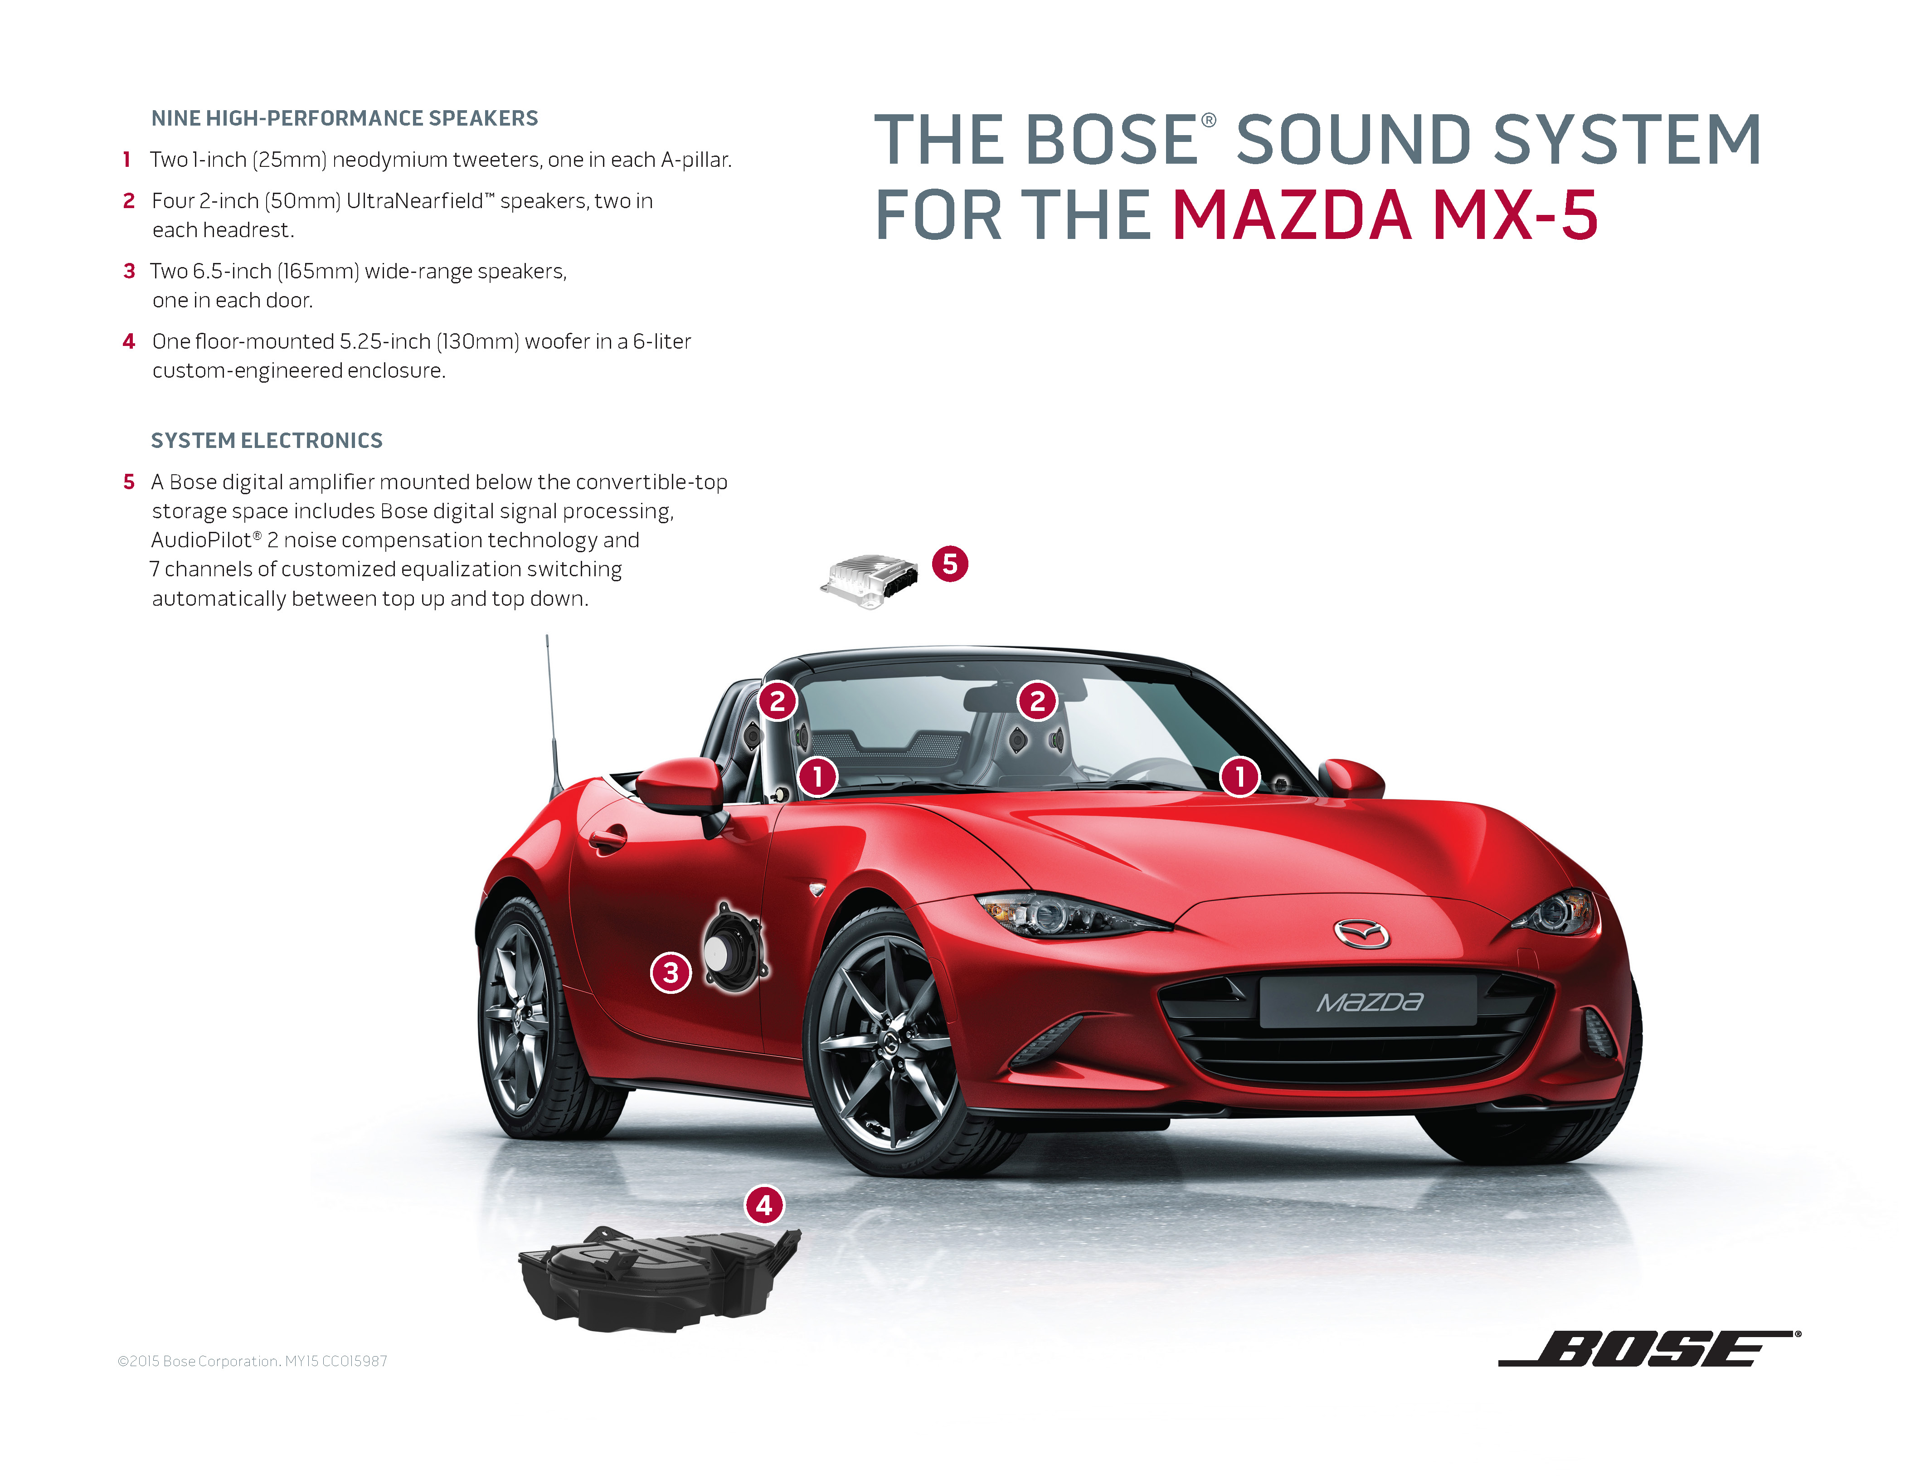 2016 Mazda Mx 5 Miata Features Redesigned Bose Sound System